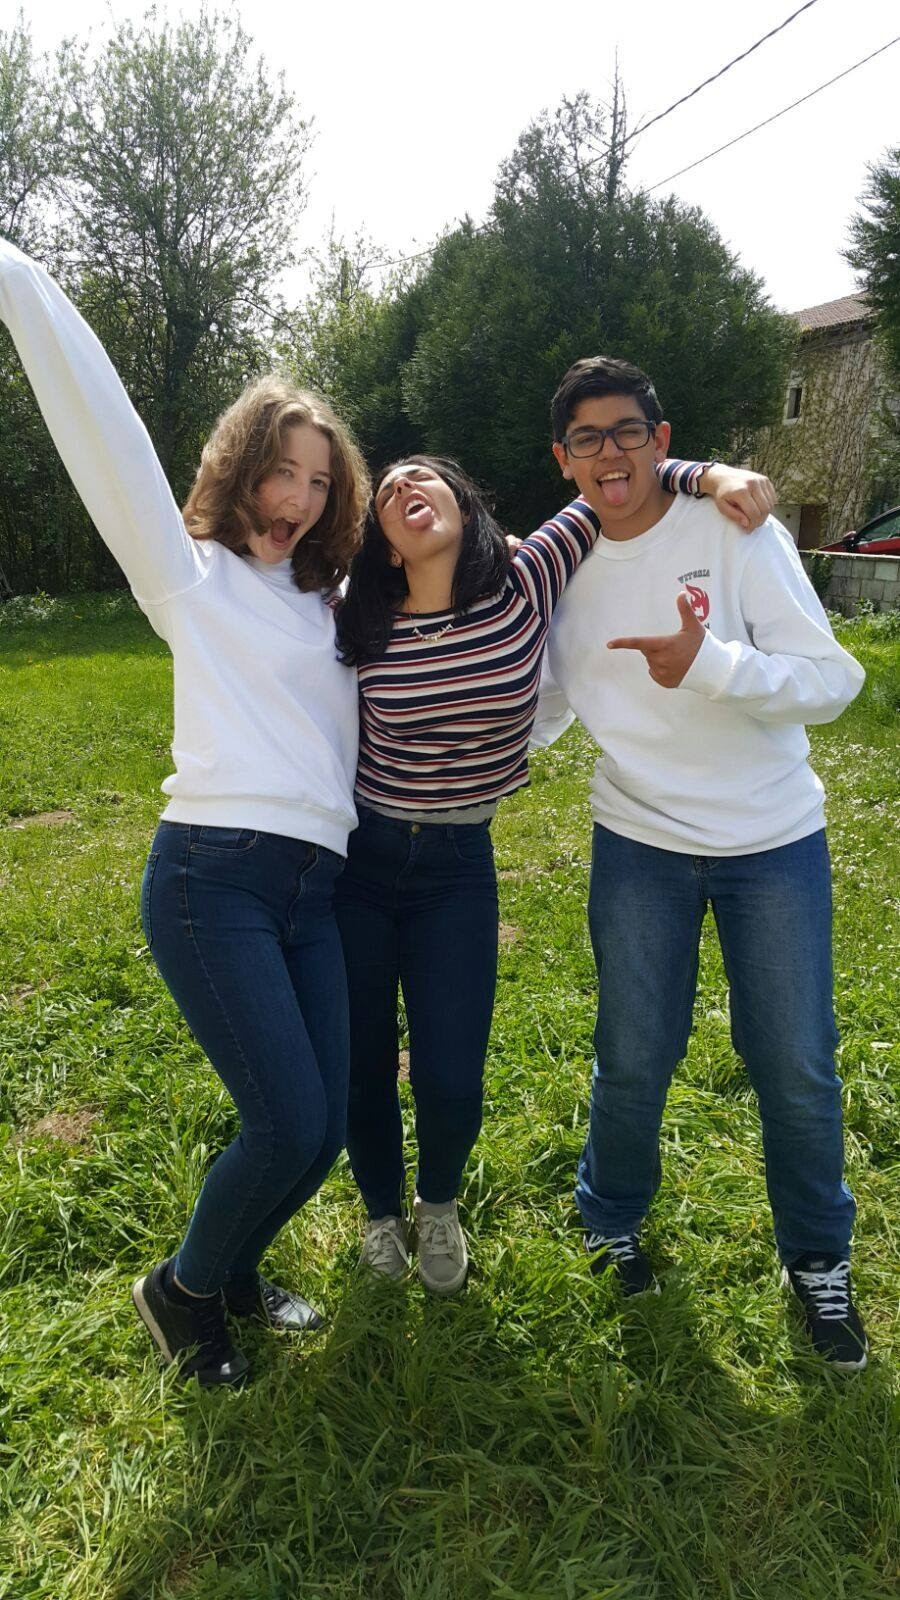 2017.04.13-16 - Pascua Jovenes SdJ (46)